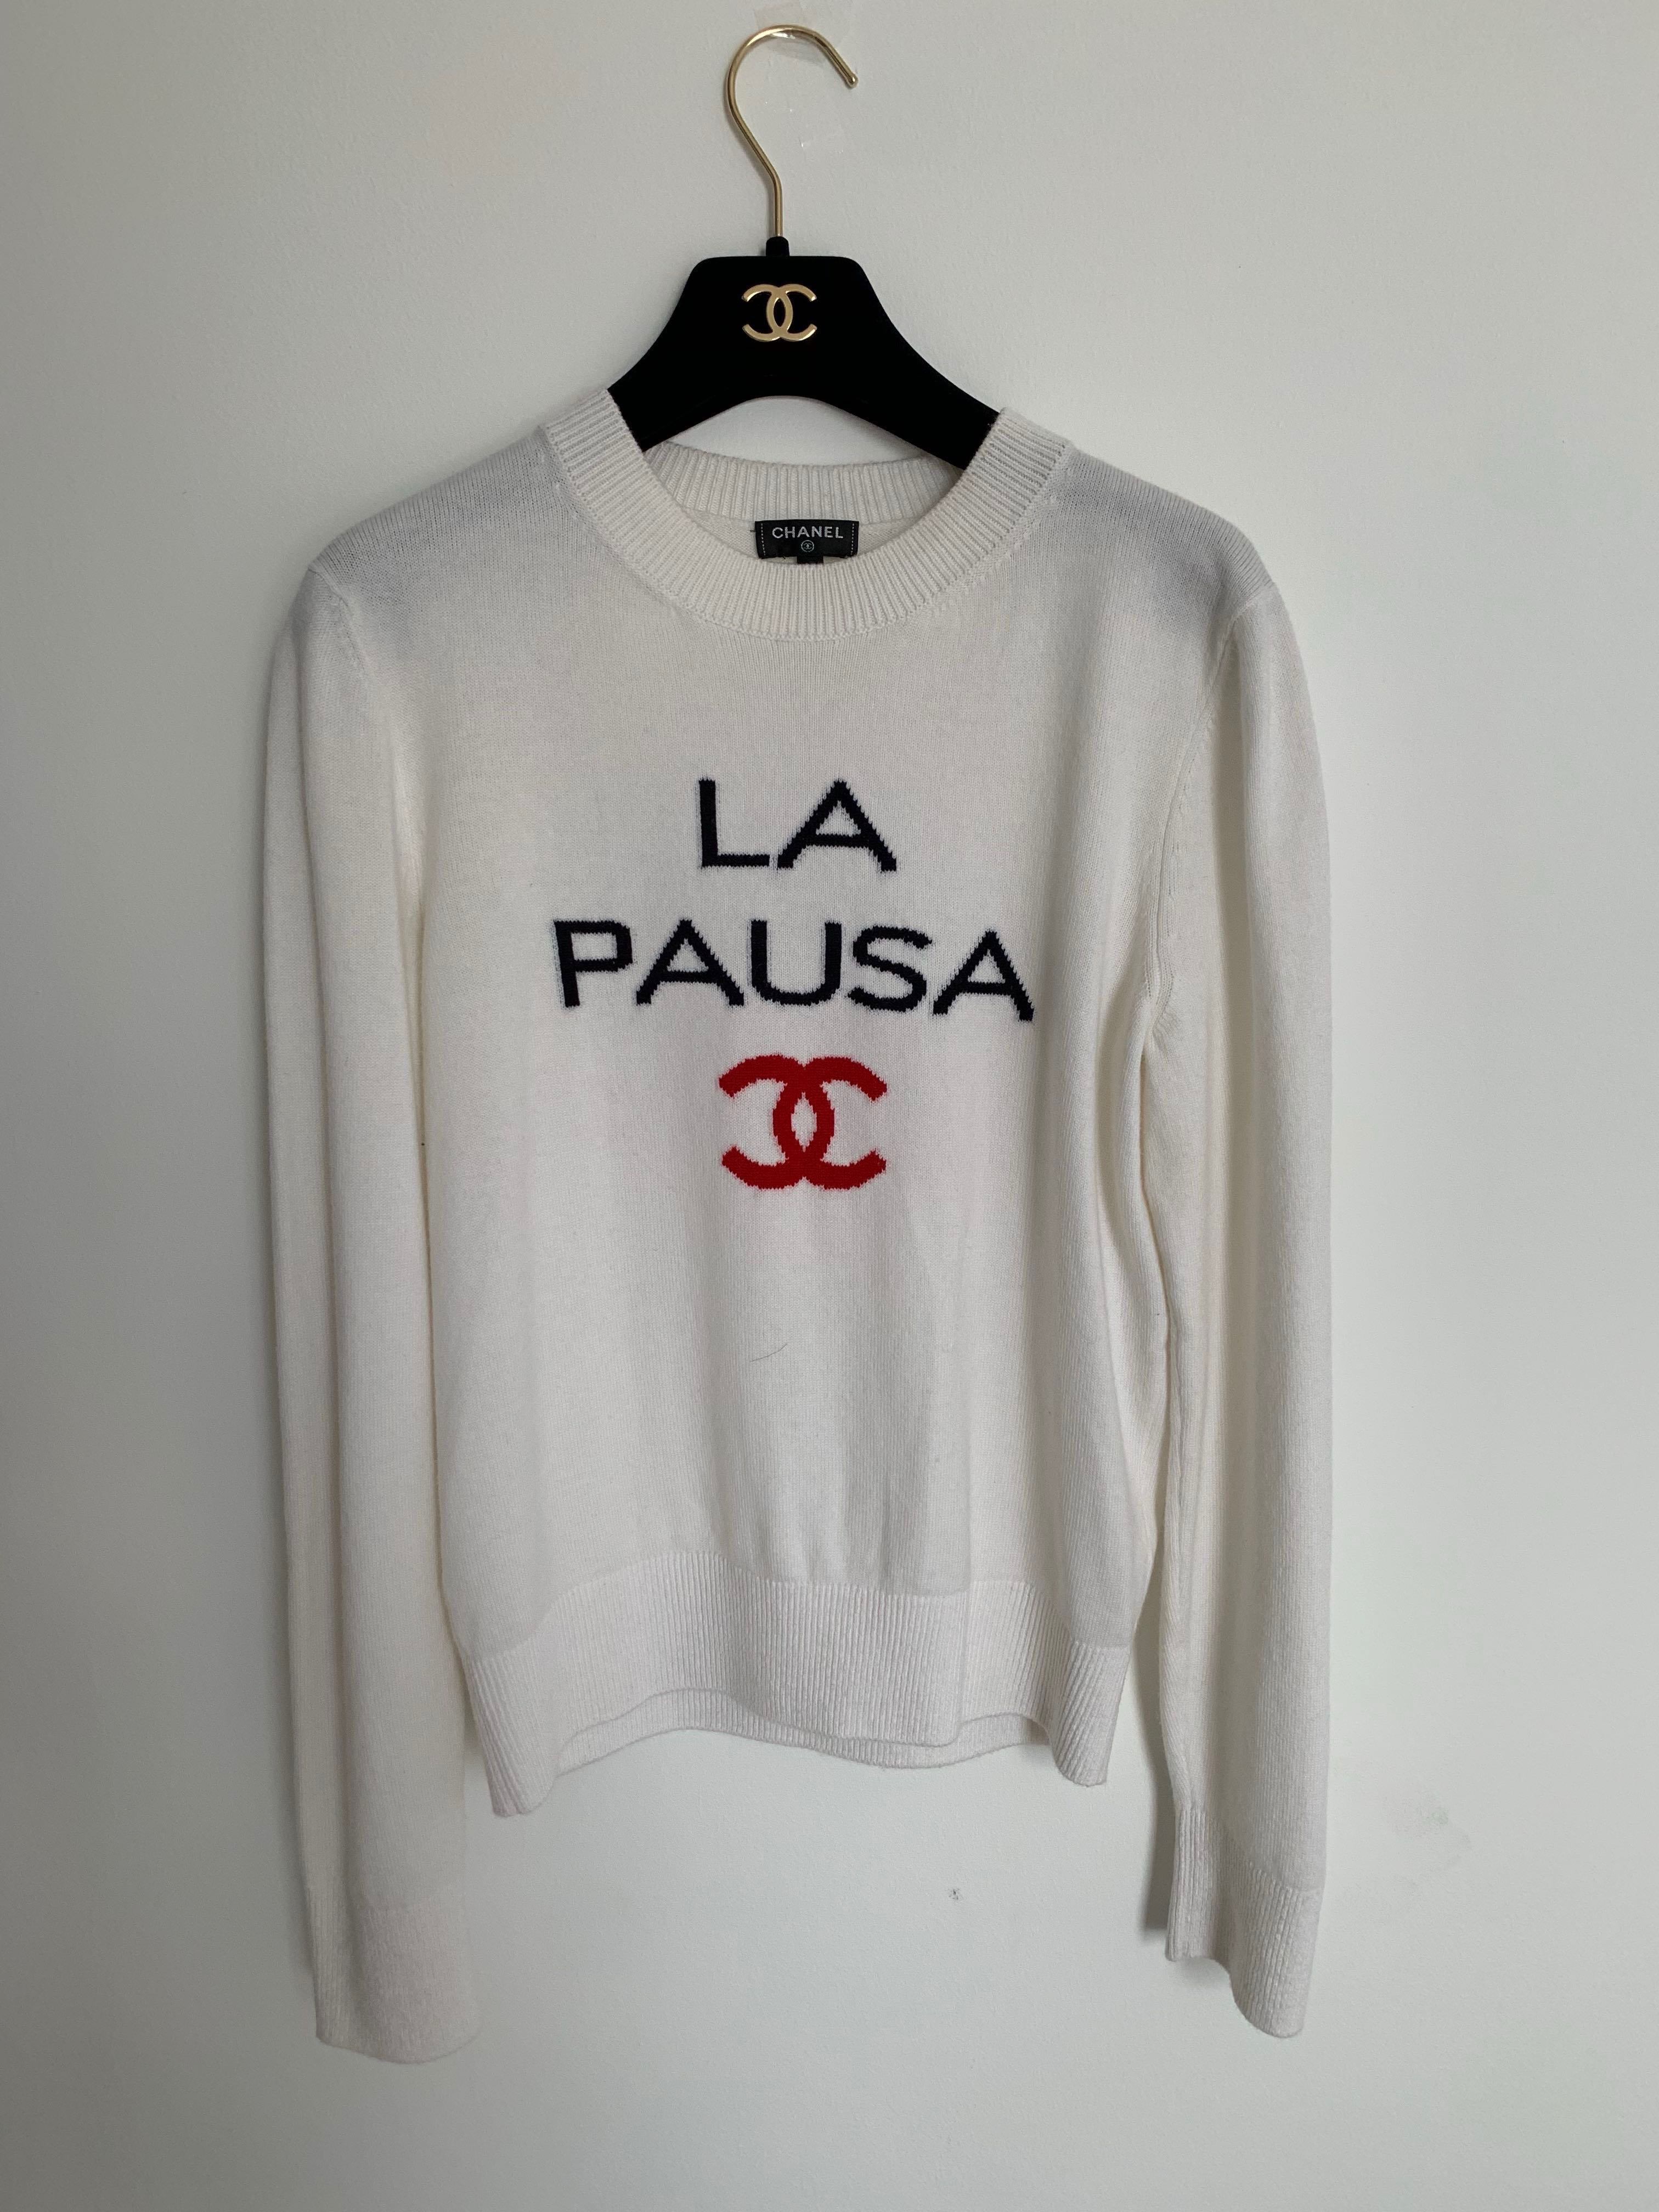 d37acad37b96 Chanel La Pausa Top, Luxury, Apparel, Women's on Carousell